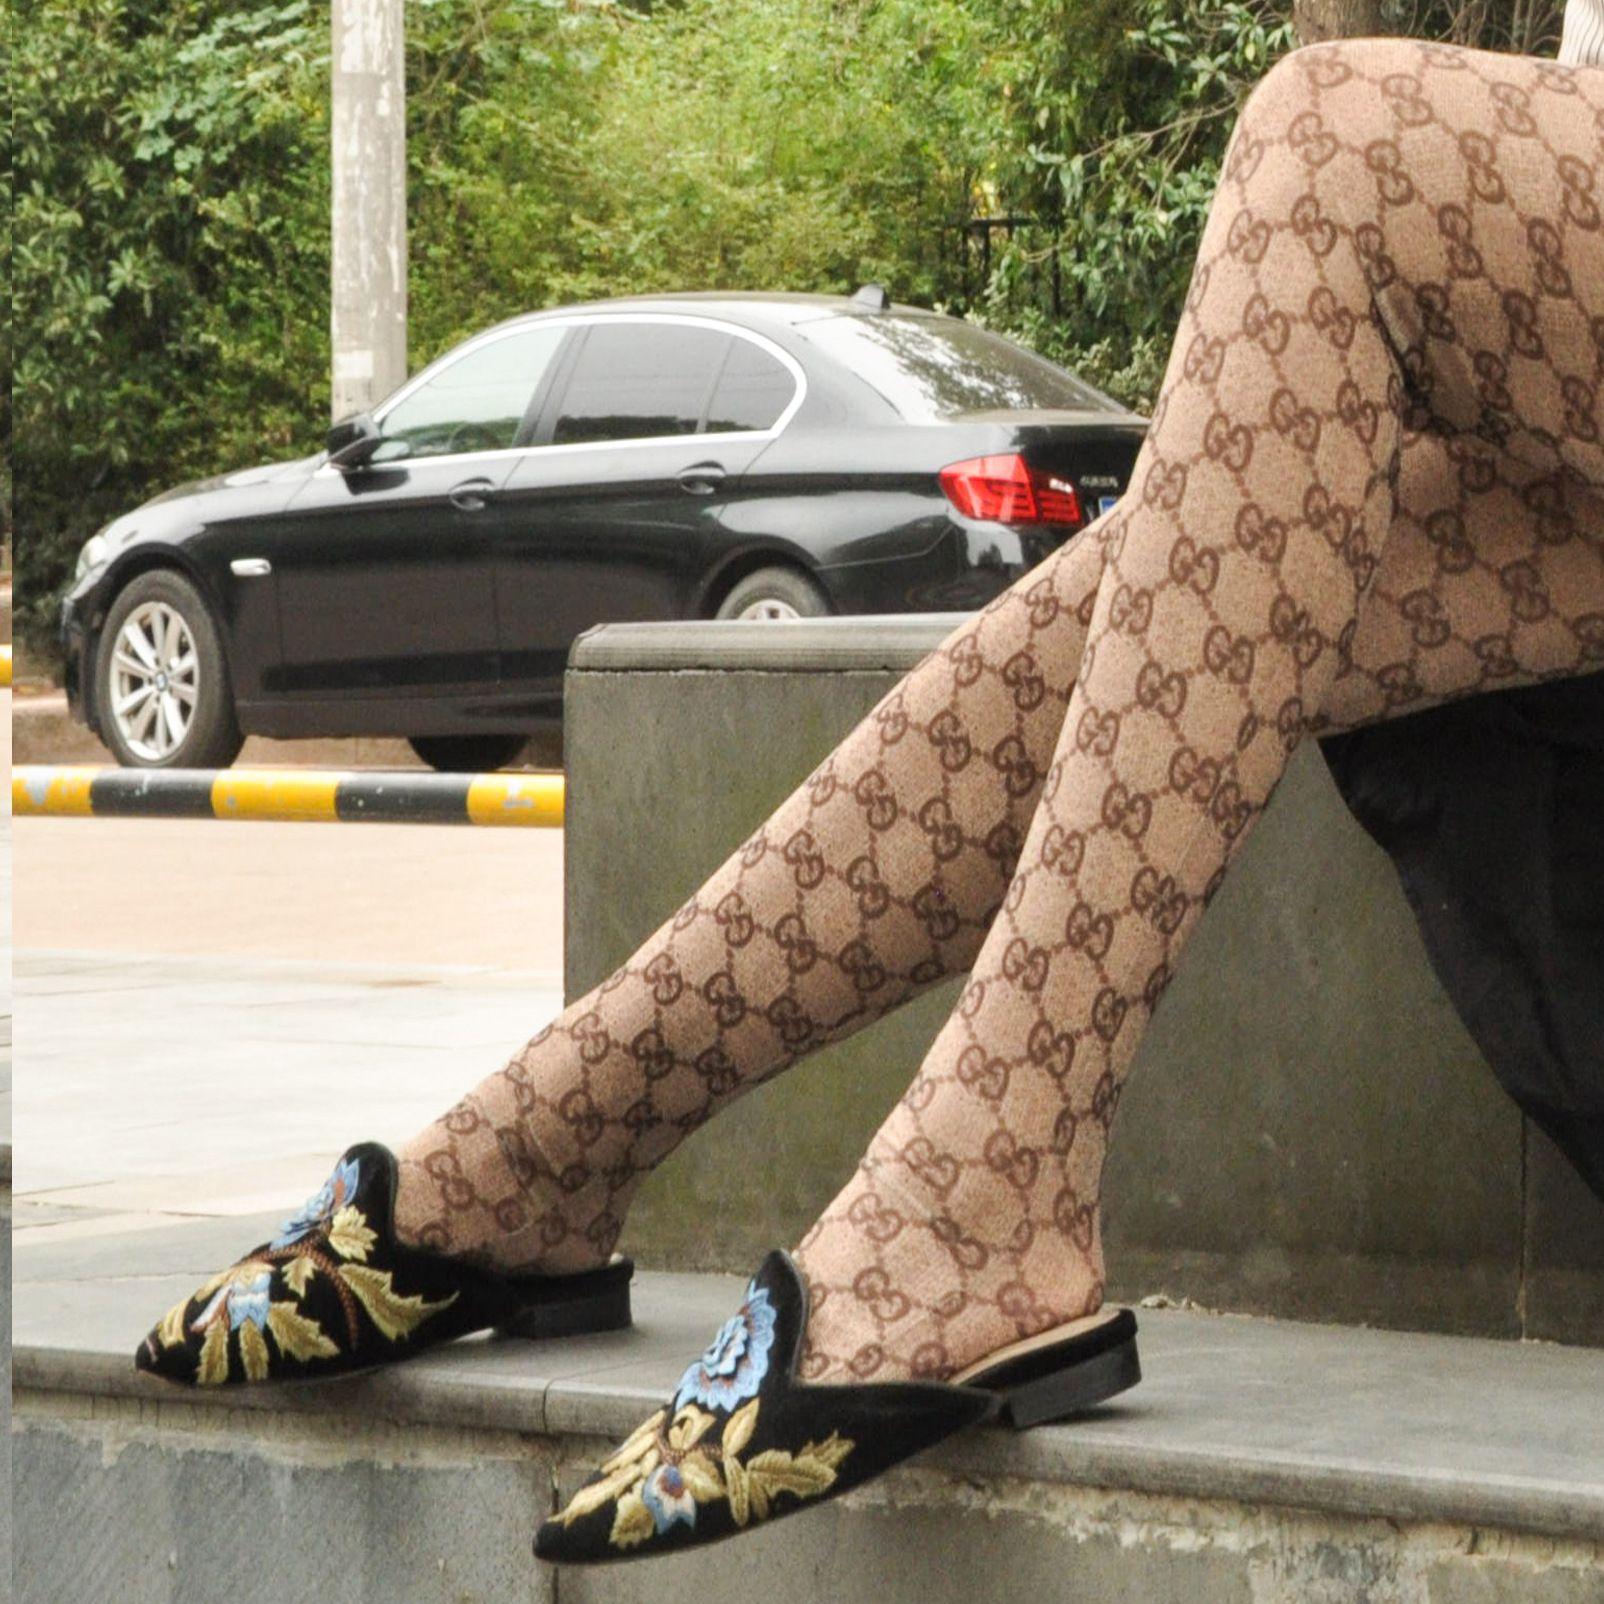 Pantynose Письмо Priented Леггинсы телесного Stretch Плюс размер носки Мода Гренадины осень и зима